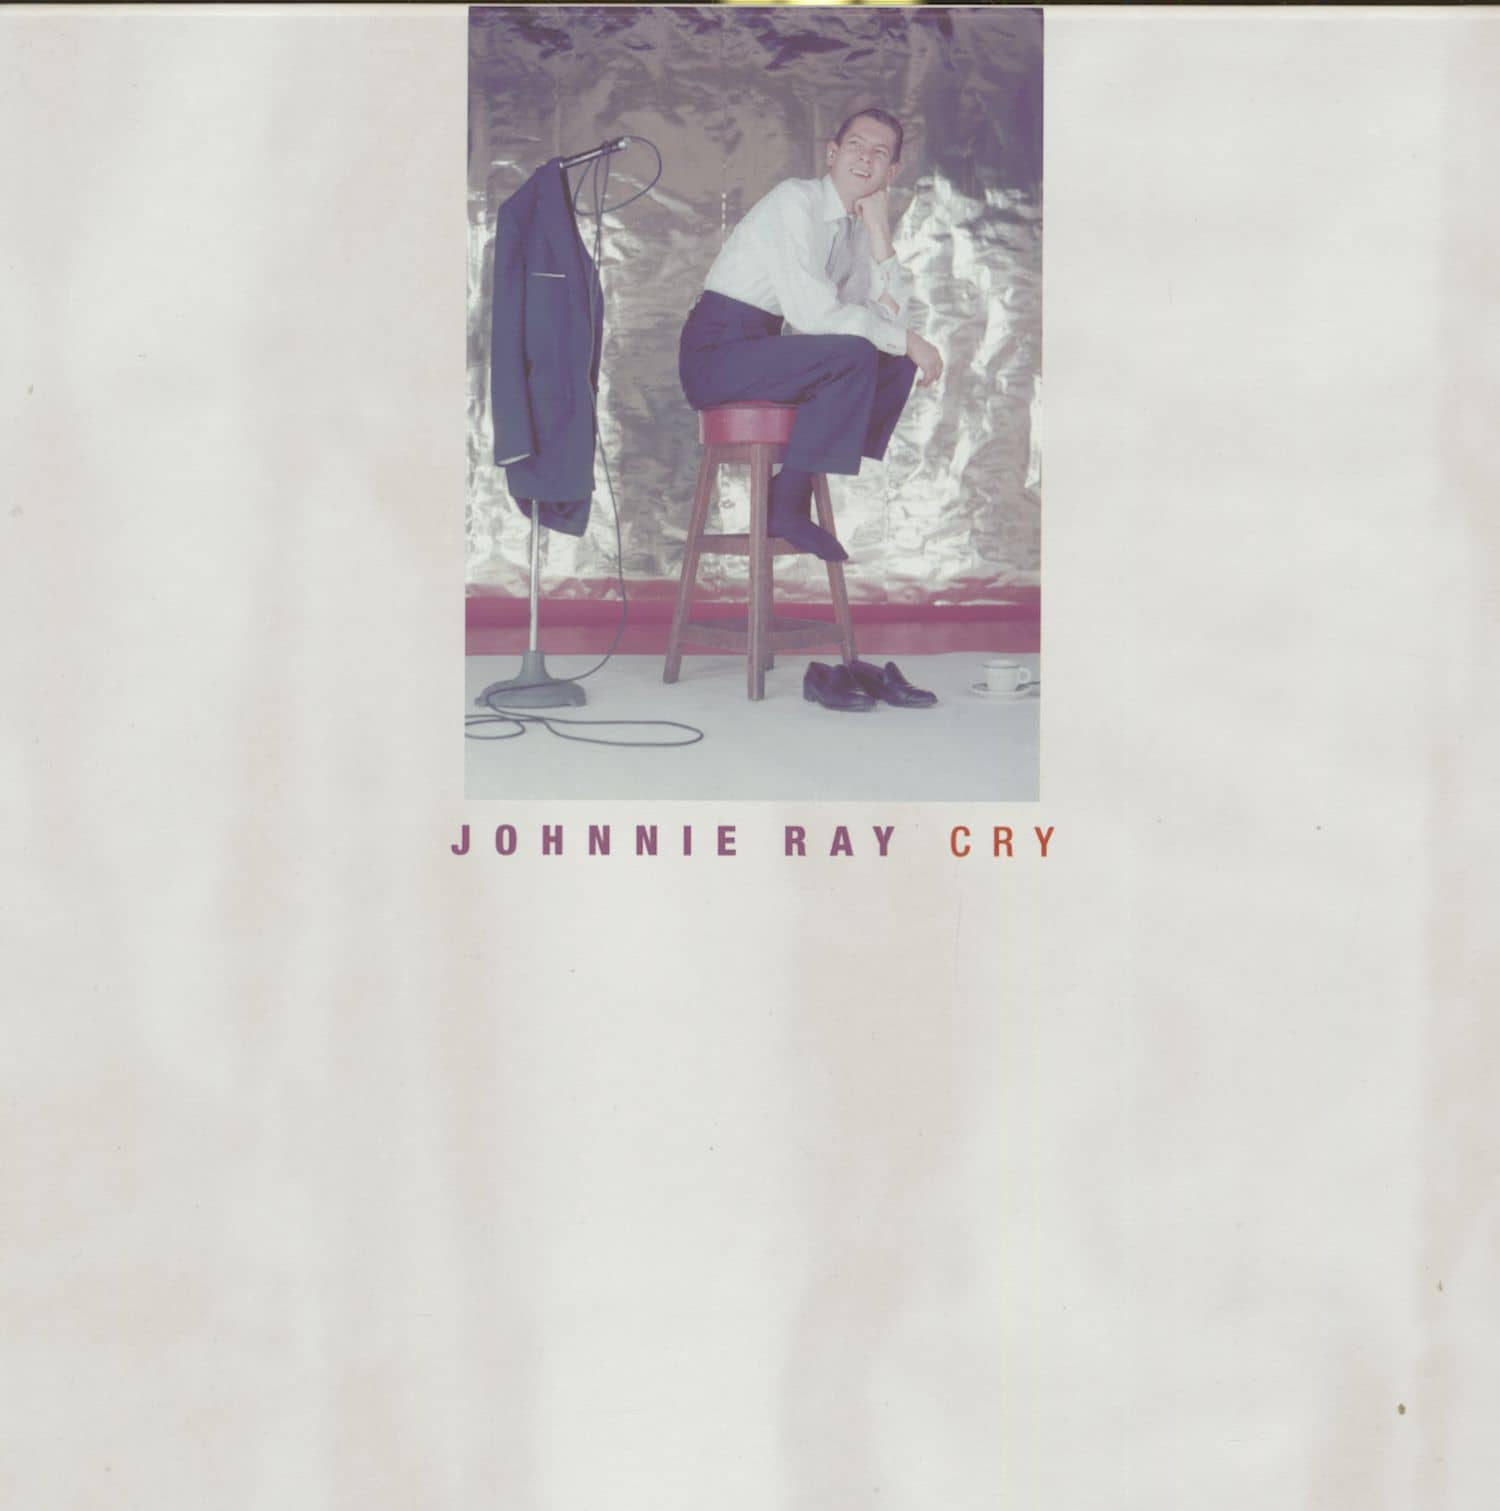 Johnnie Ray Cry (5-CD)